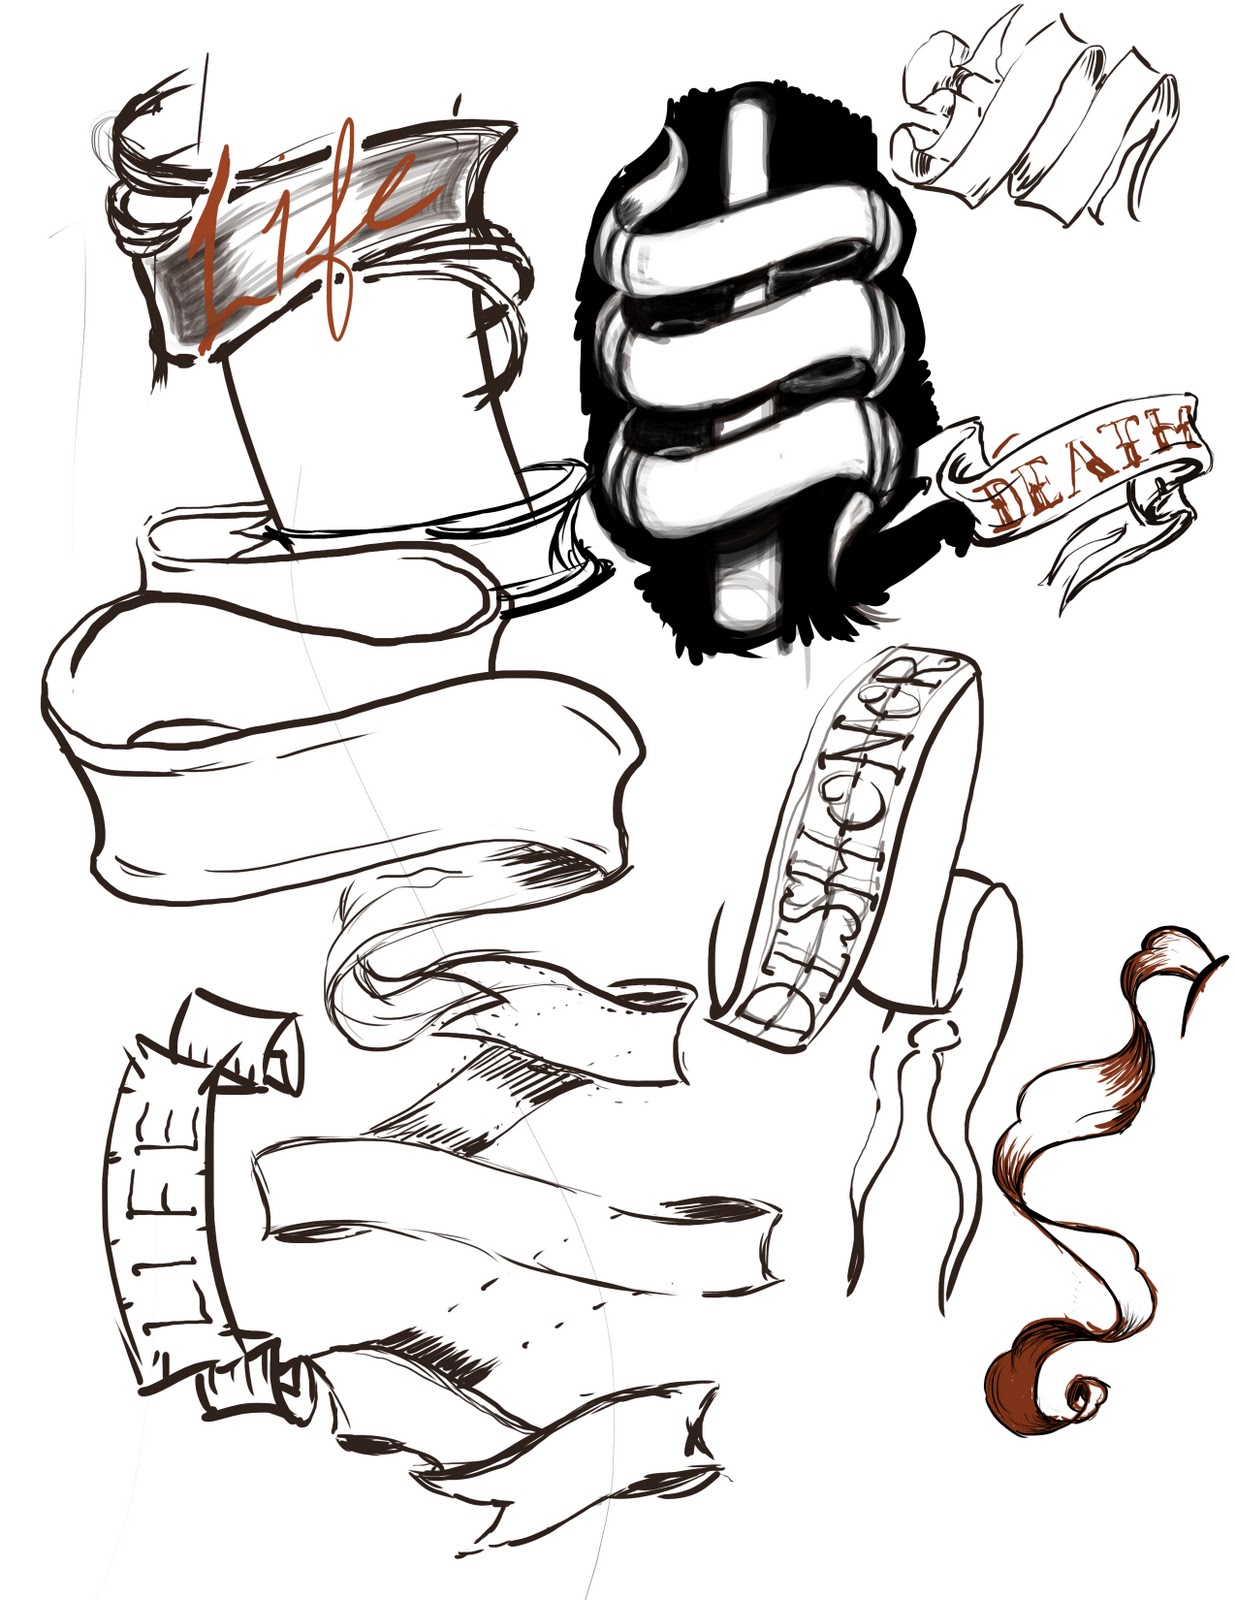 Boi S Illustration Blog January